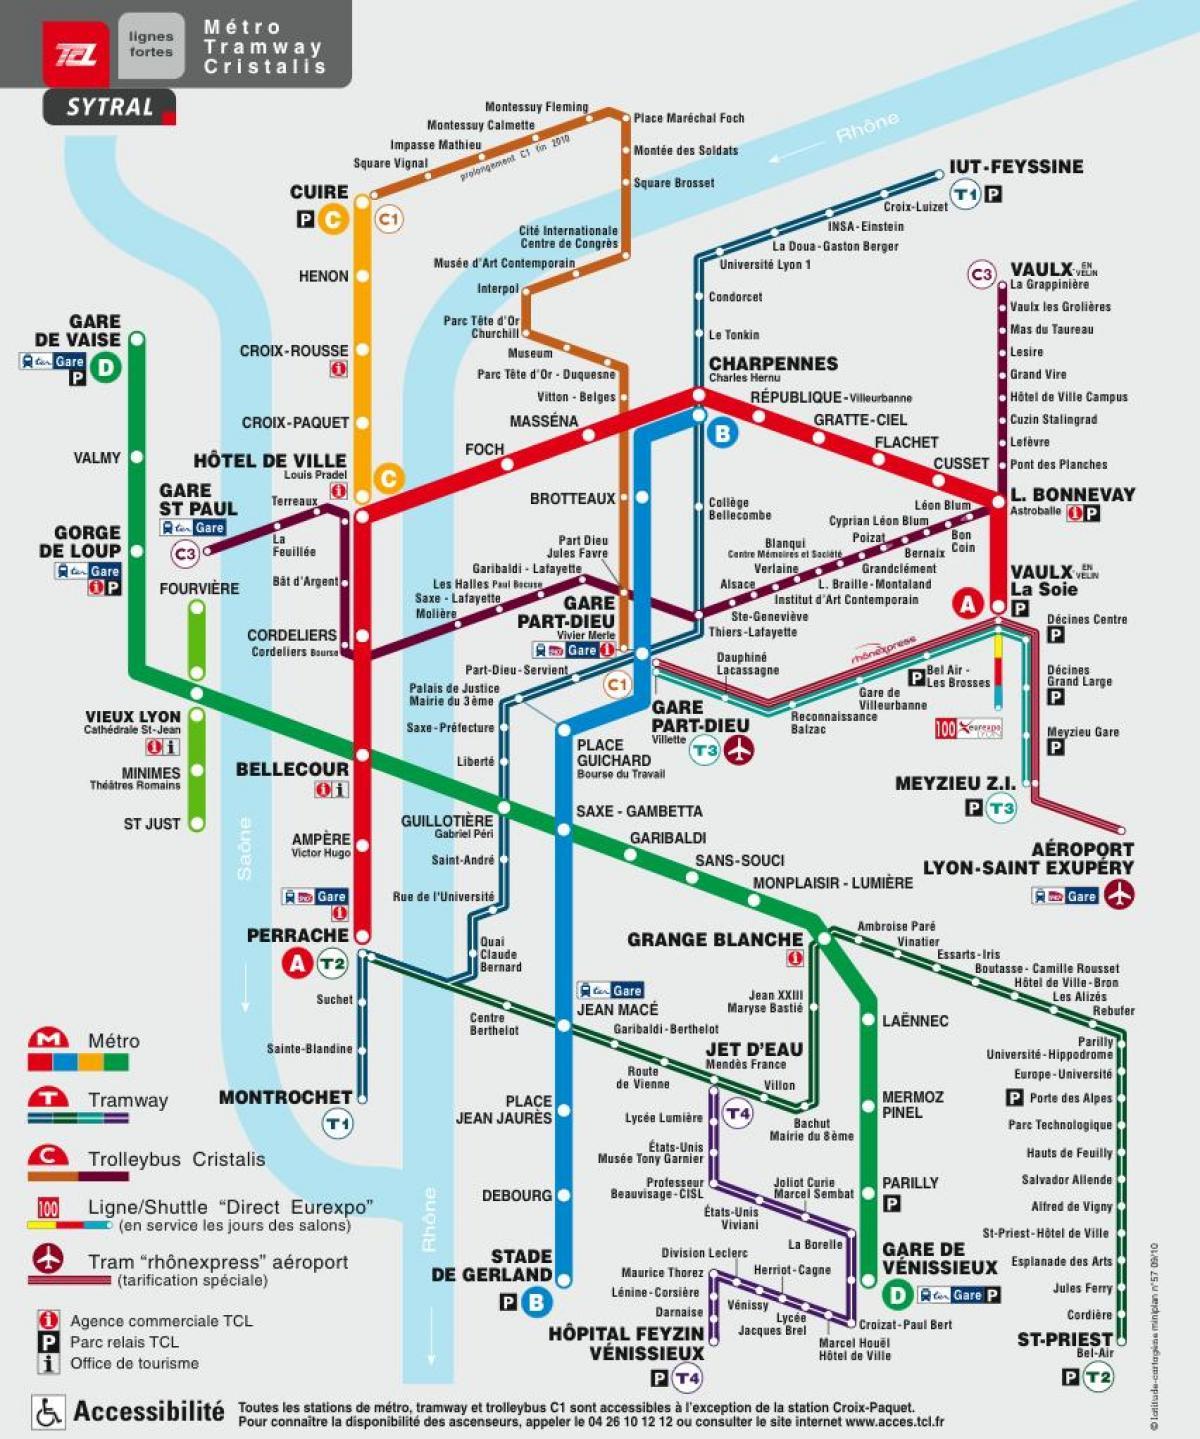 Naples Subway Map.Lyon Subway Map Lyon Underground Map Auvergne Rhone Alpes France